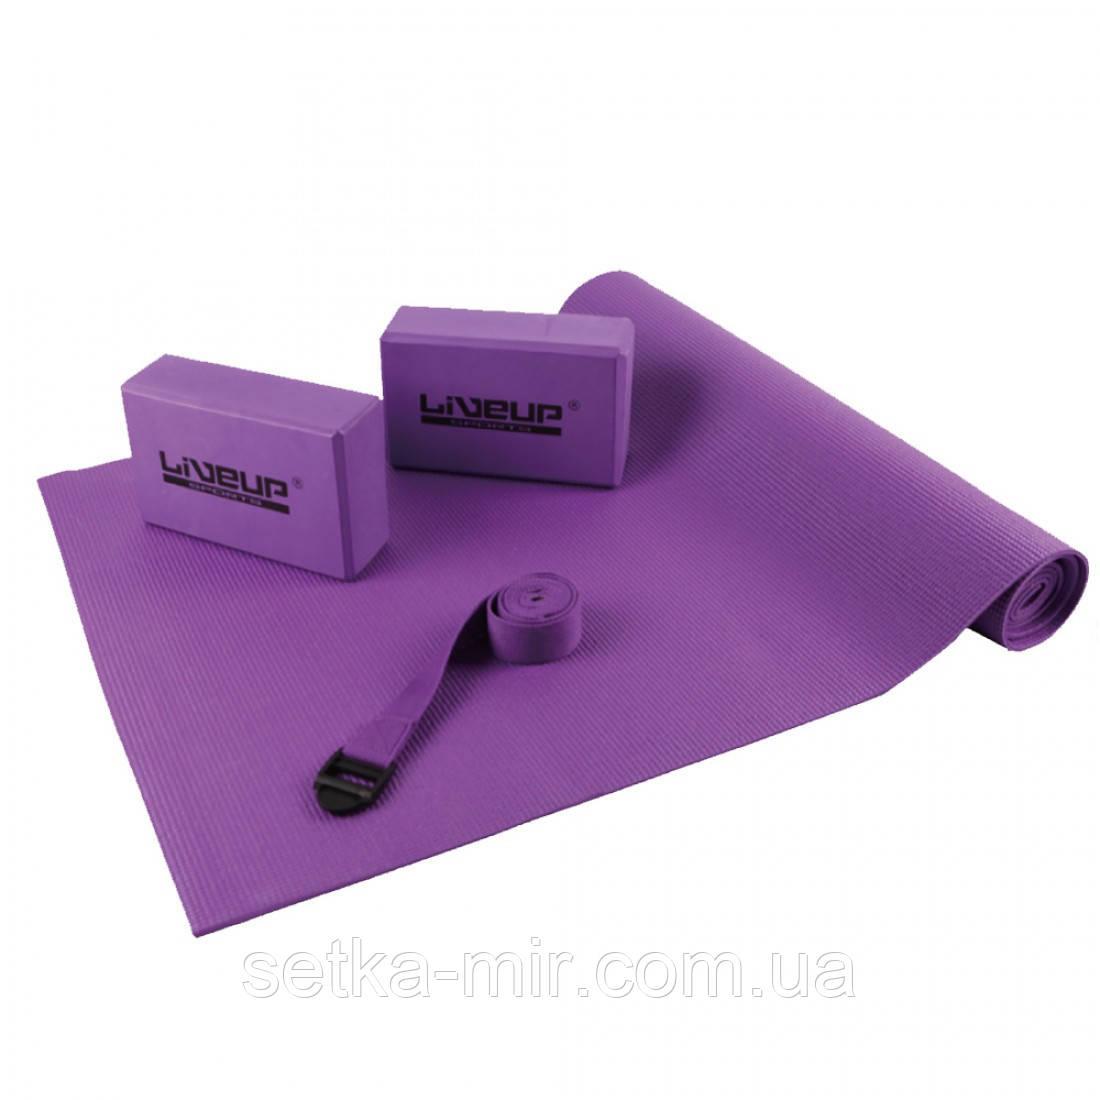 Набор для йоги LiveUp YOGA SET, LS3240